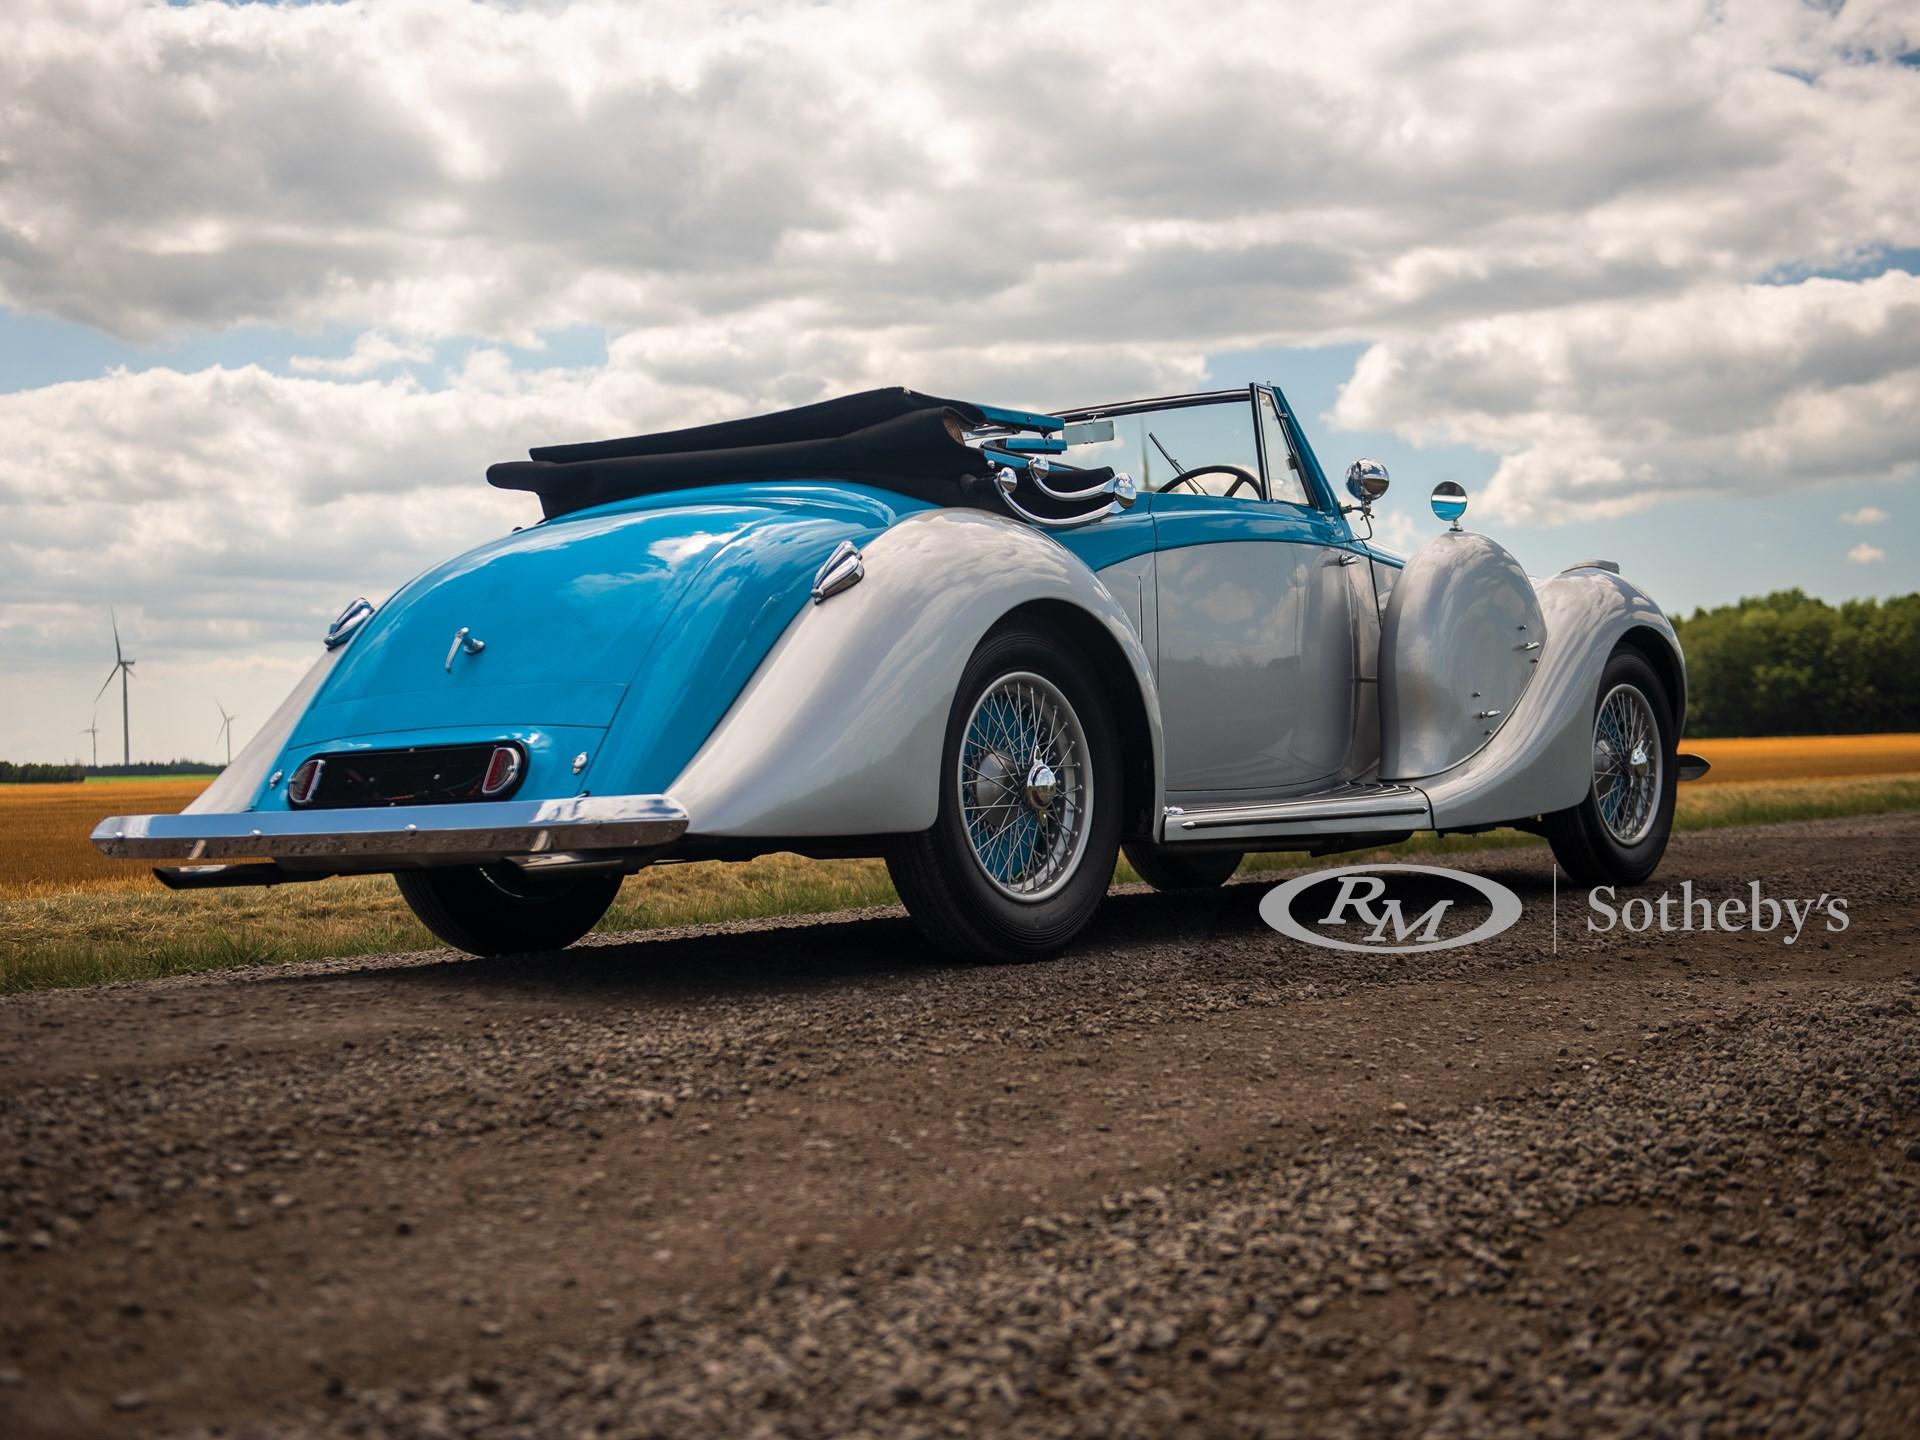 1939 Lagonda V-12 Drophead Coupe  -